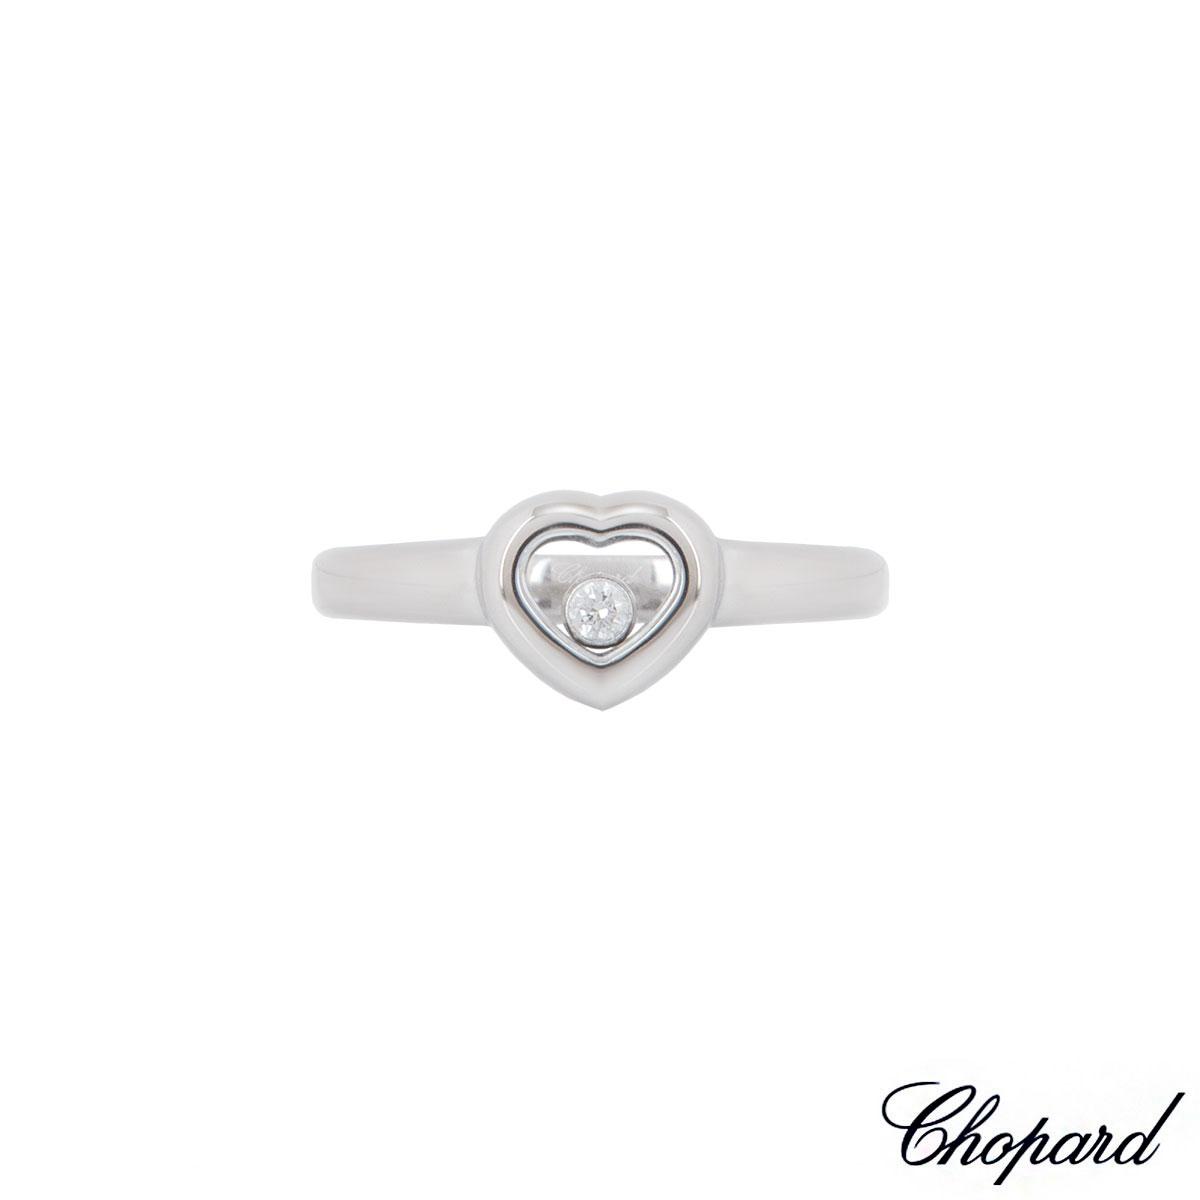 Chopard White Gold Heart Happy Diamonds Ring 82/4854